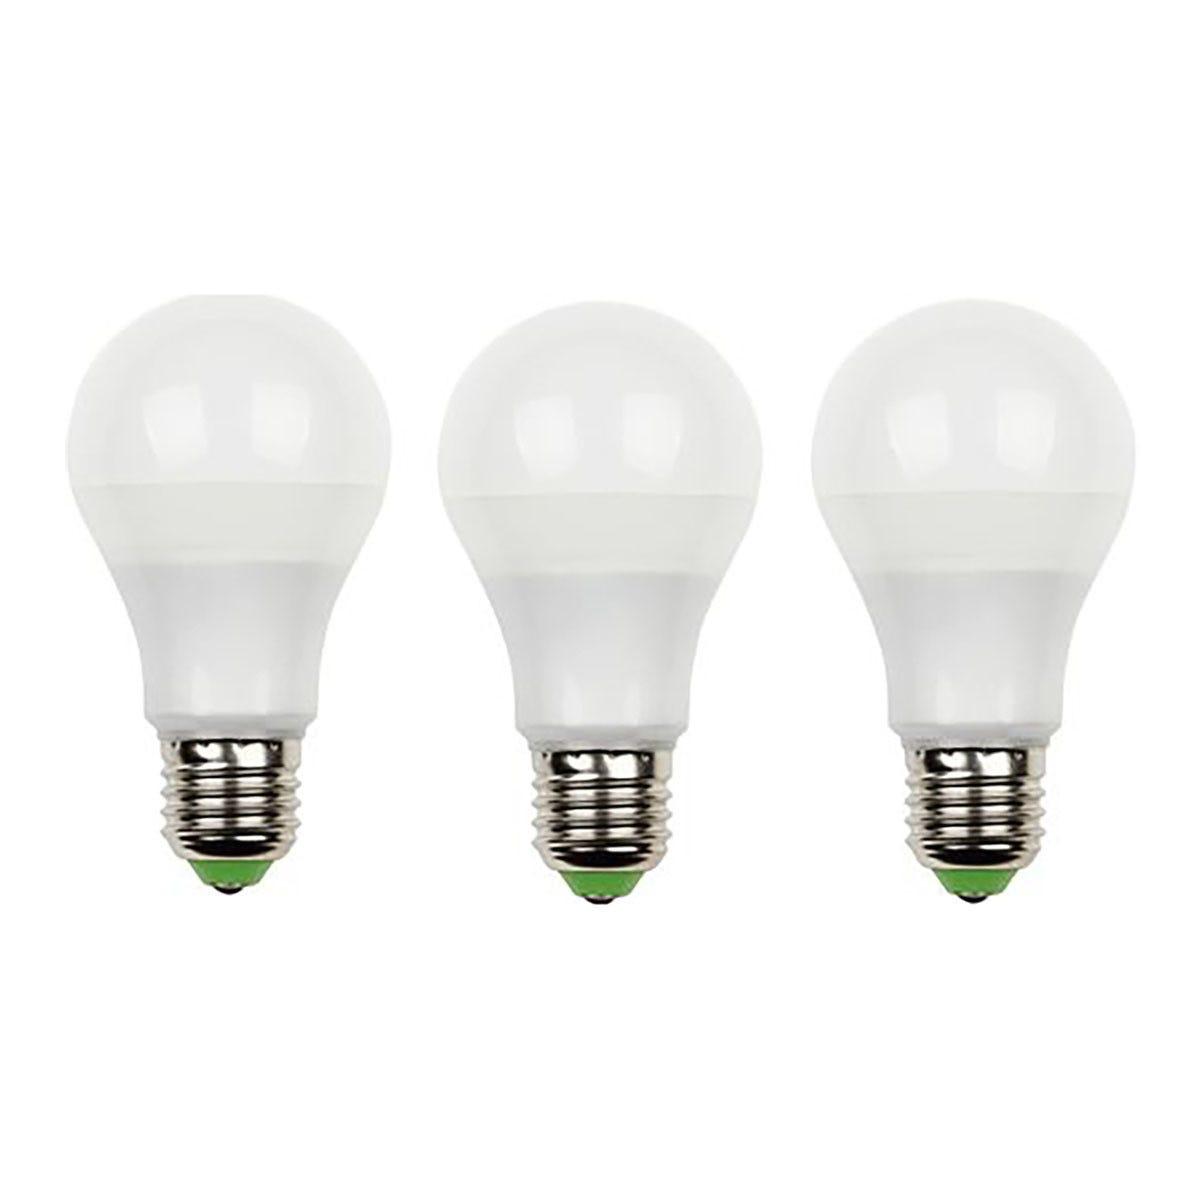 parko 3 lampadine  led goccia 11w e27 1050 lumen 6500k luce fredda